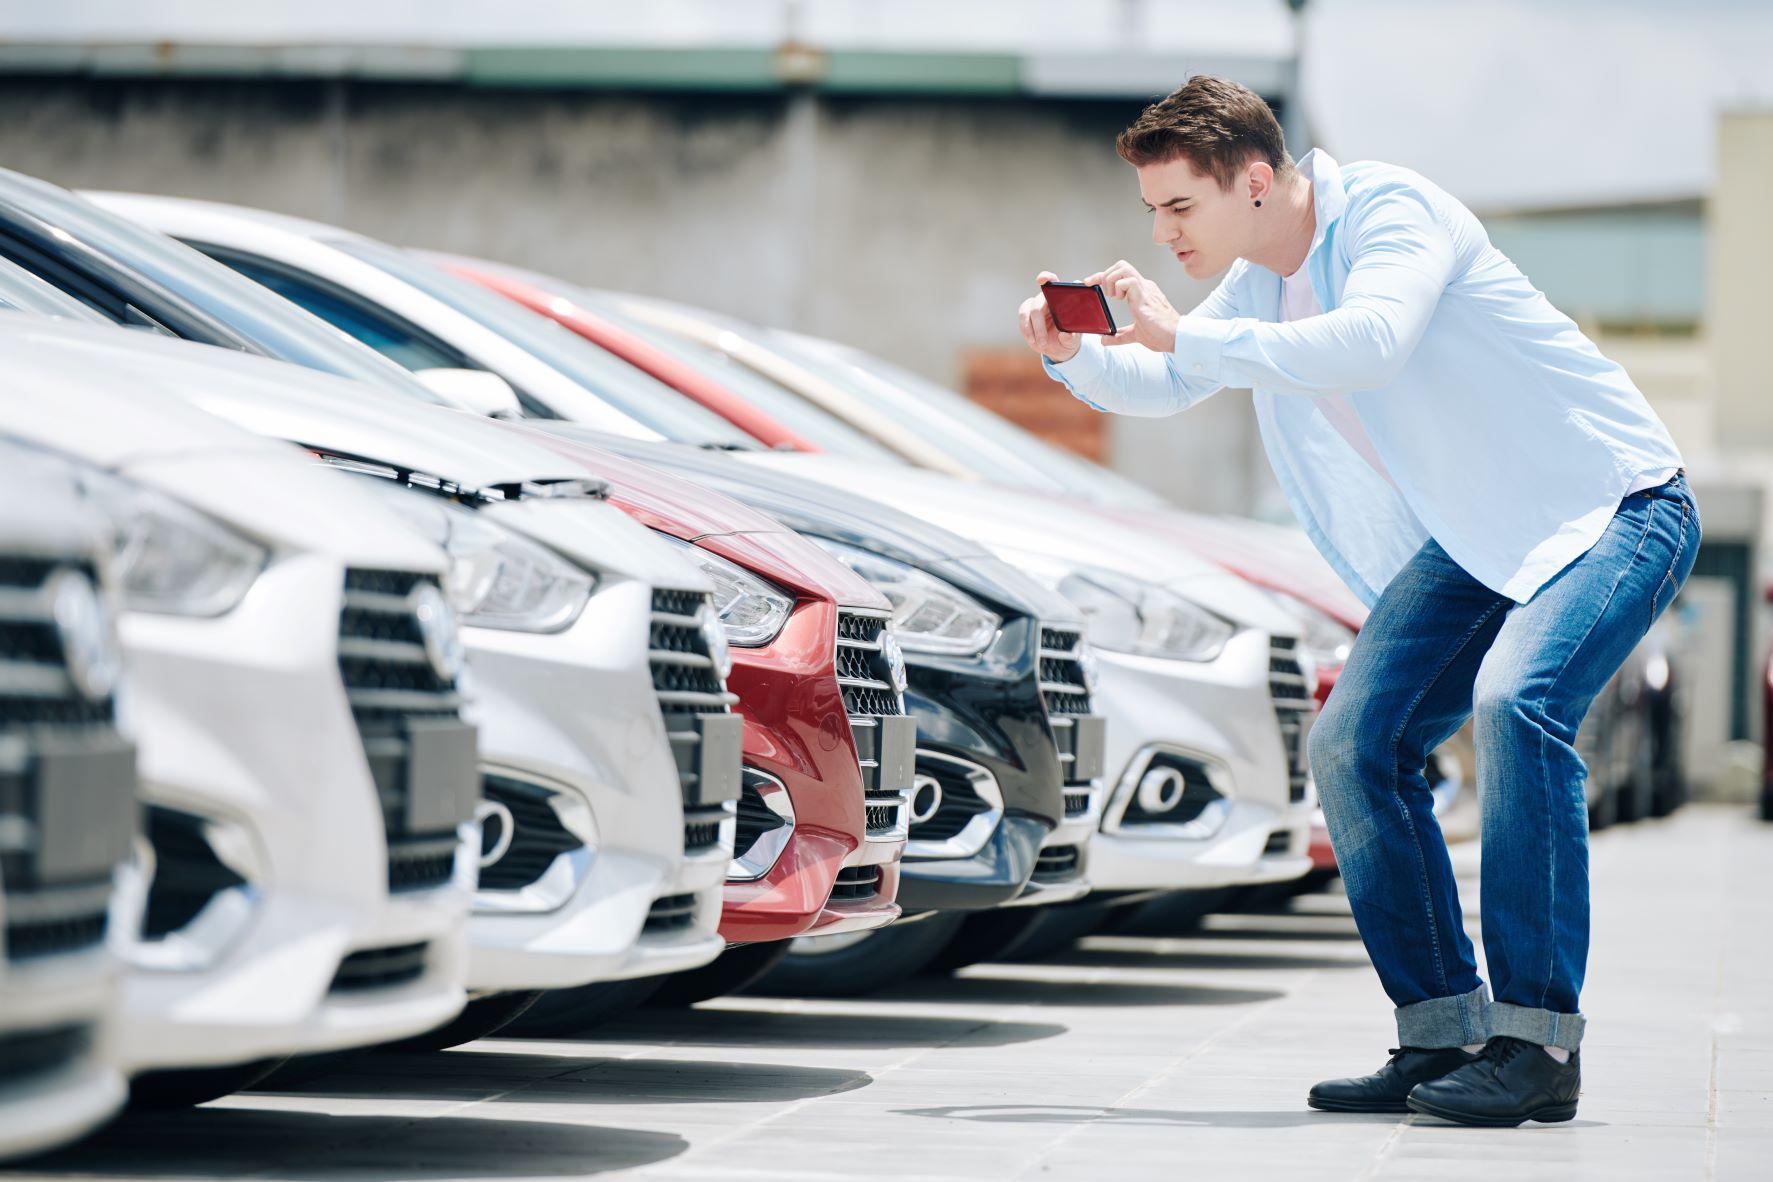 customer at car dealership taking pictures